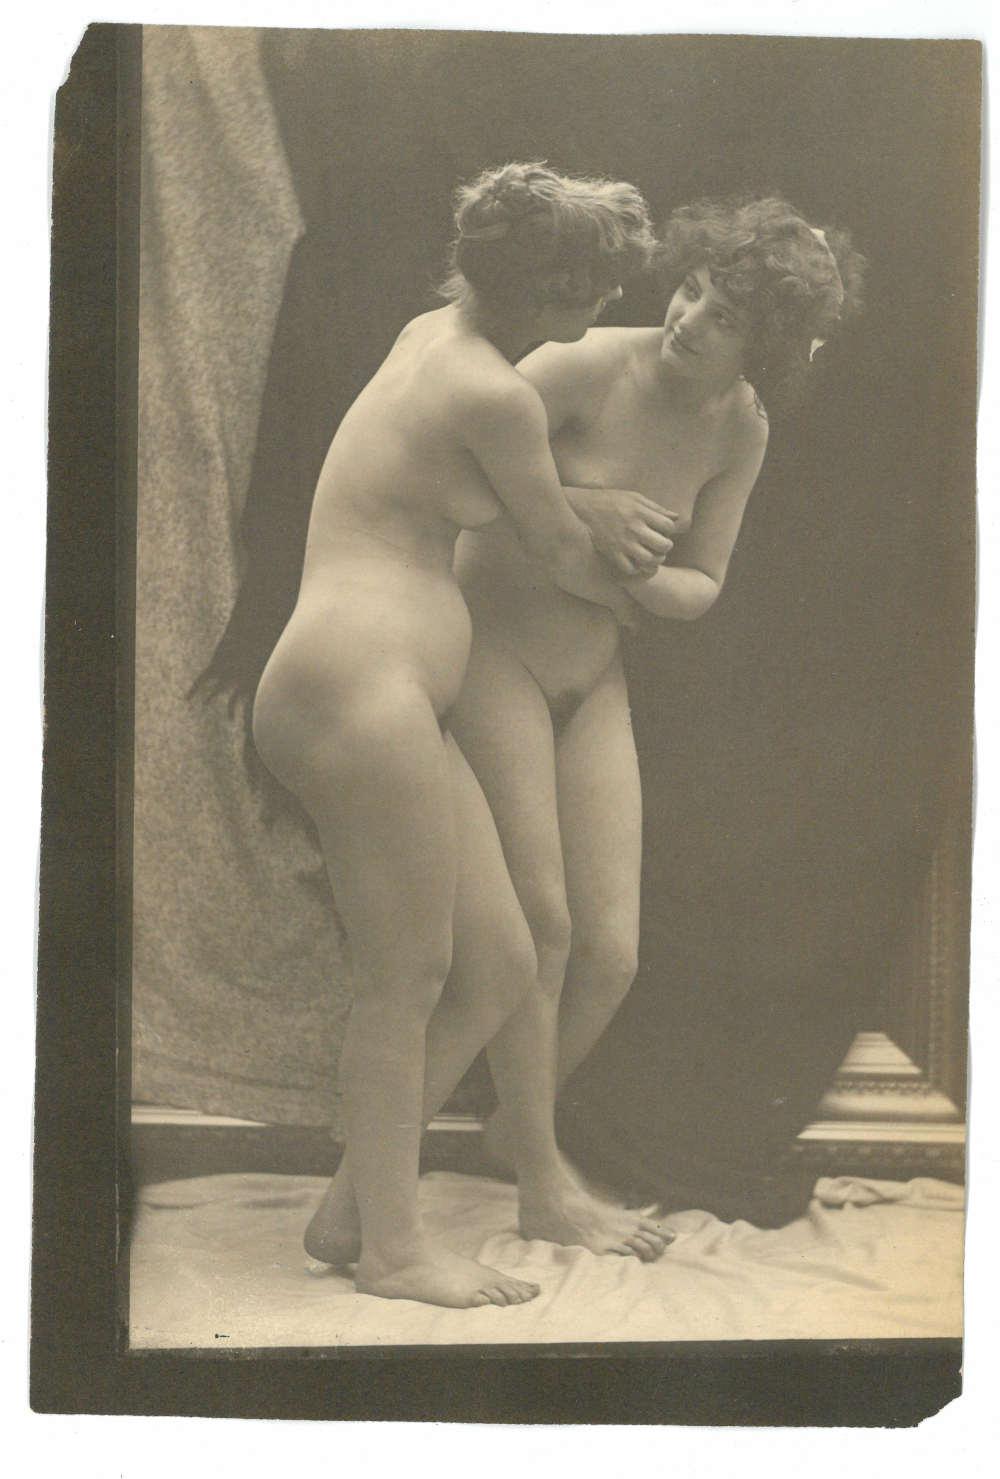 Erotic London, Erotic Art London, Erotic Art in London, 18 Stafford Terrace, Linley Sambourne